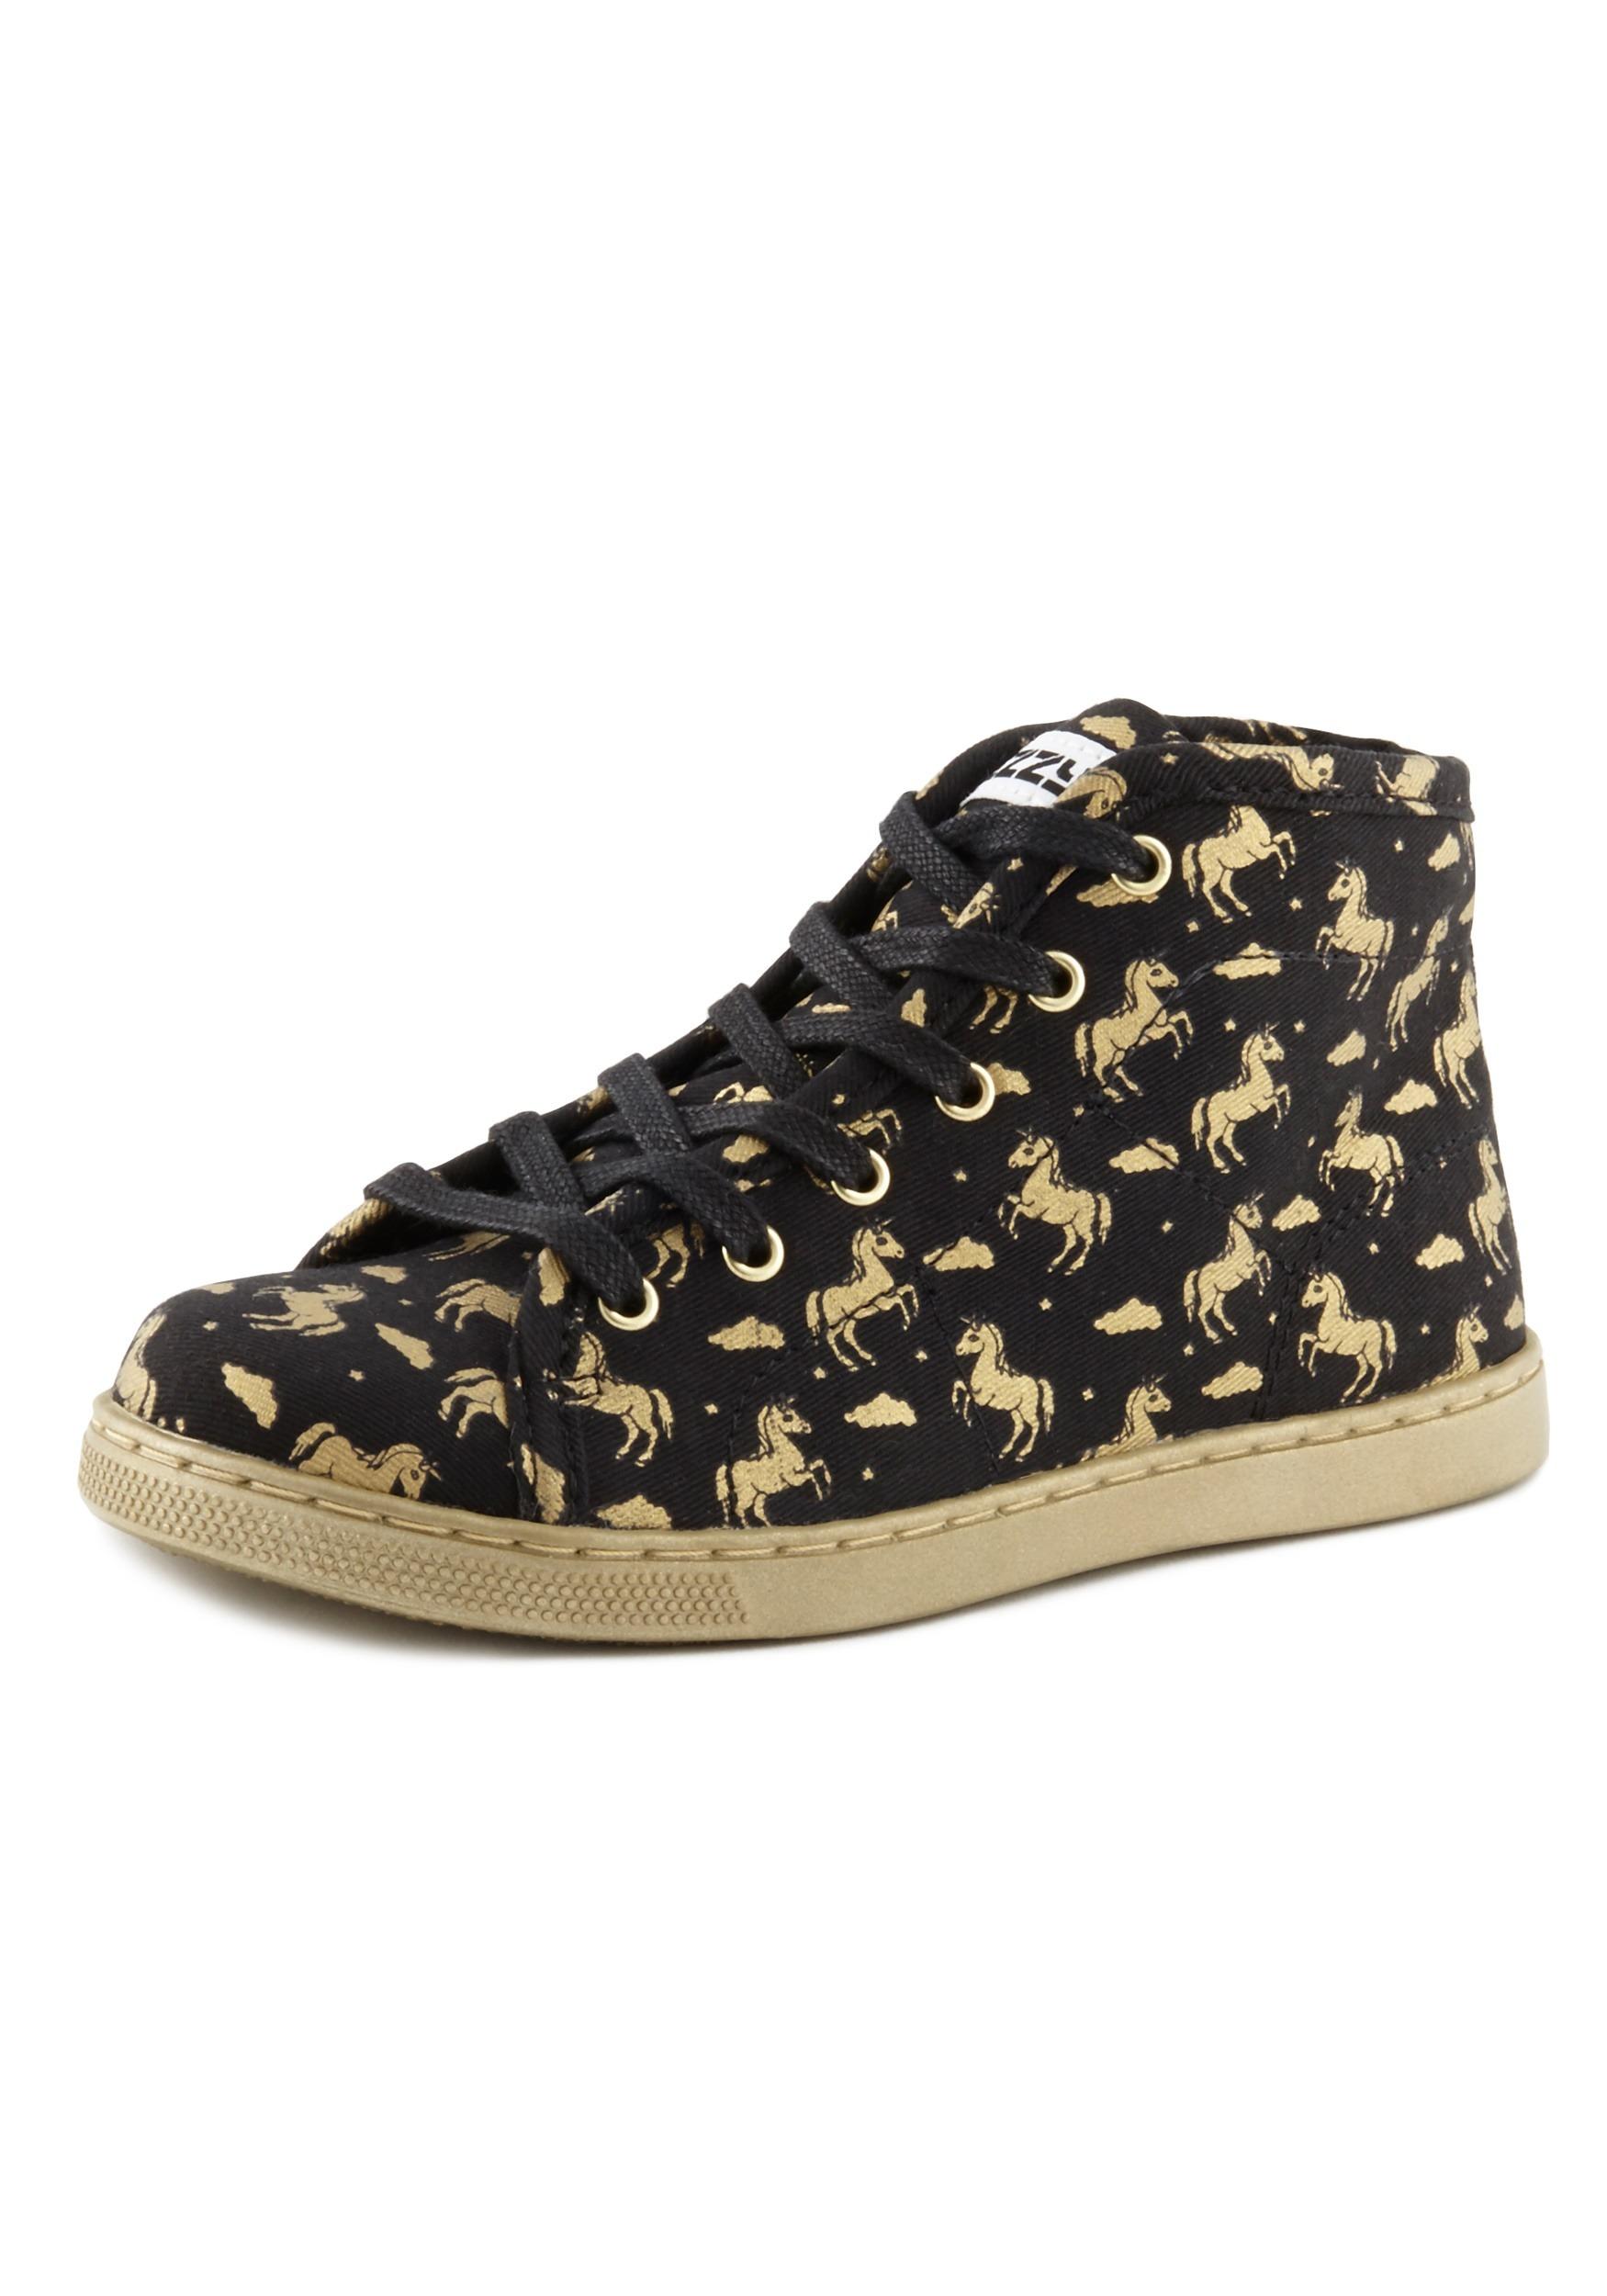 Unicorn Hi Top Shoes for Children